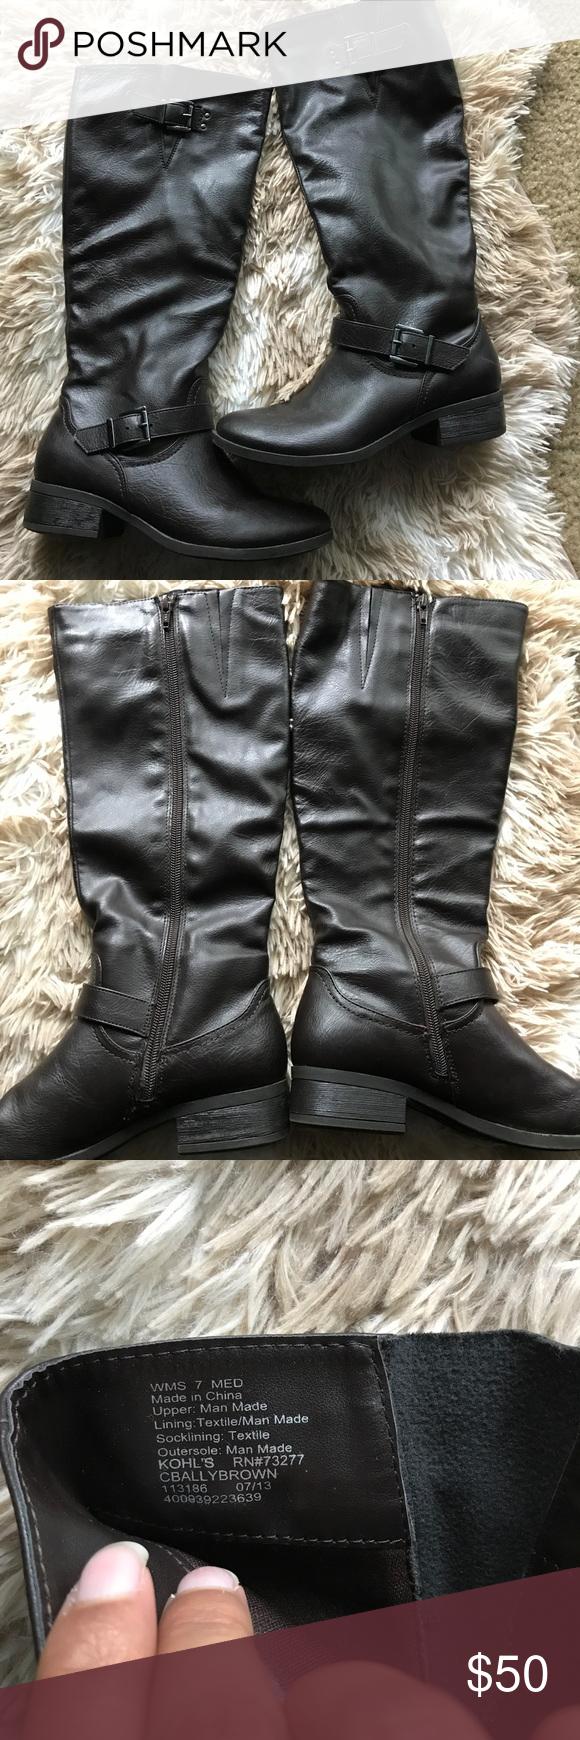 3e781a665b03 Chocolate brown riding boots Worn three times chocolate brown riding boots  size 7 go right below